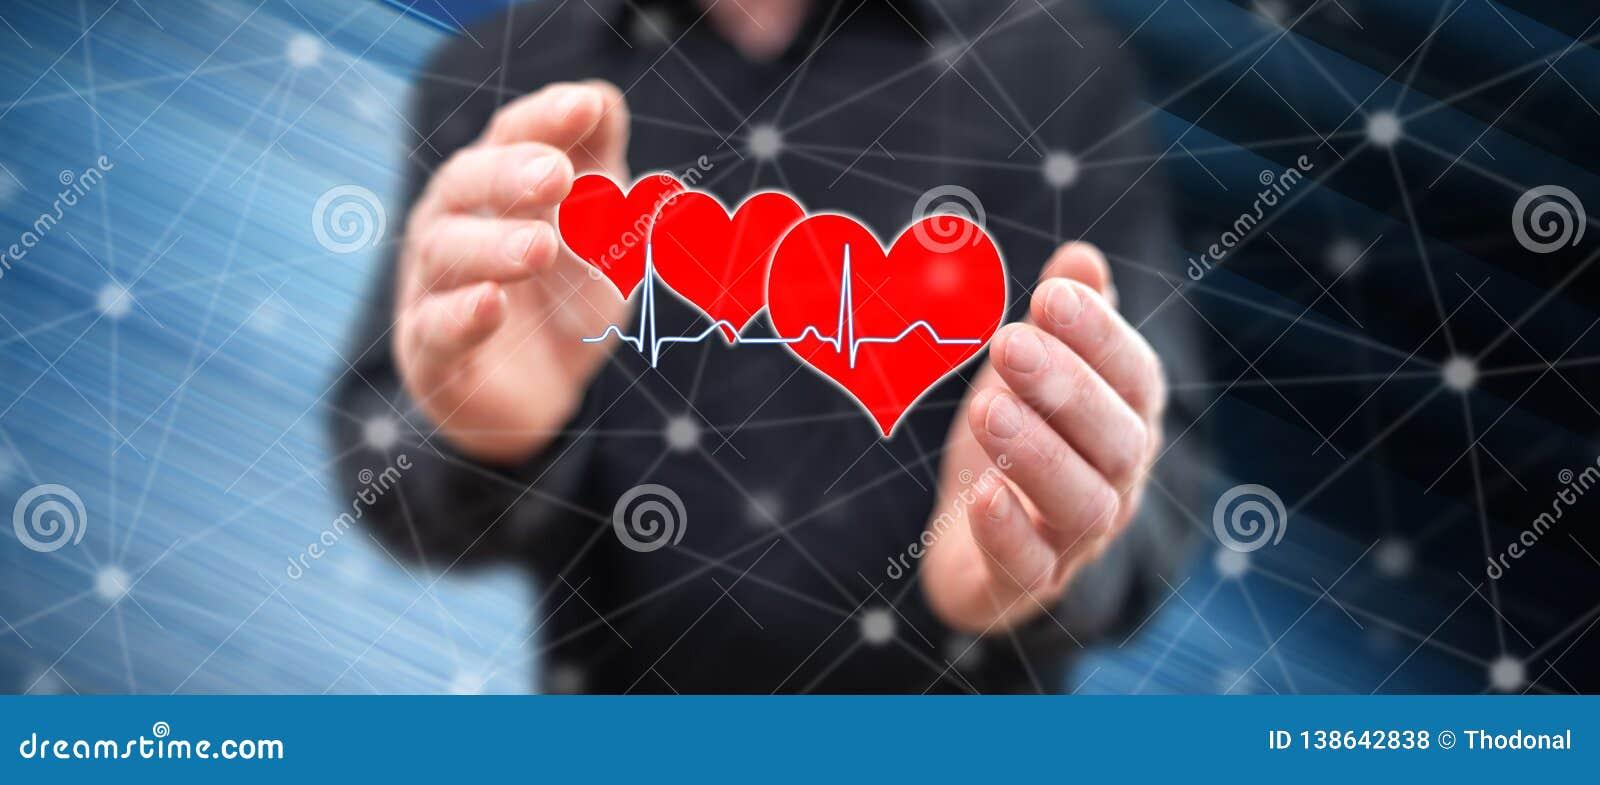 Concept of a heart beats graph